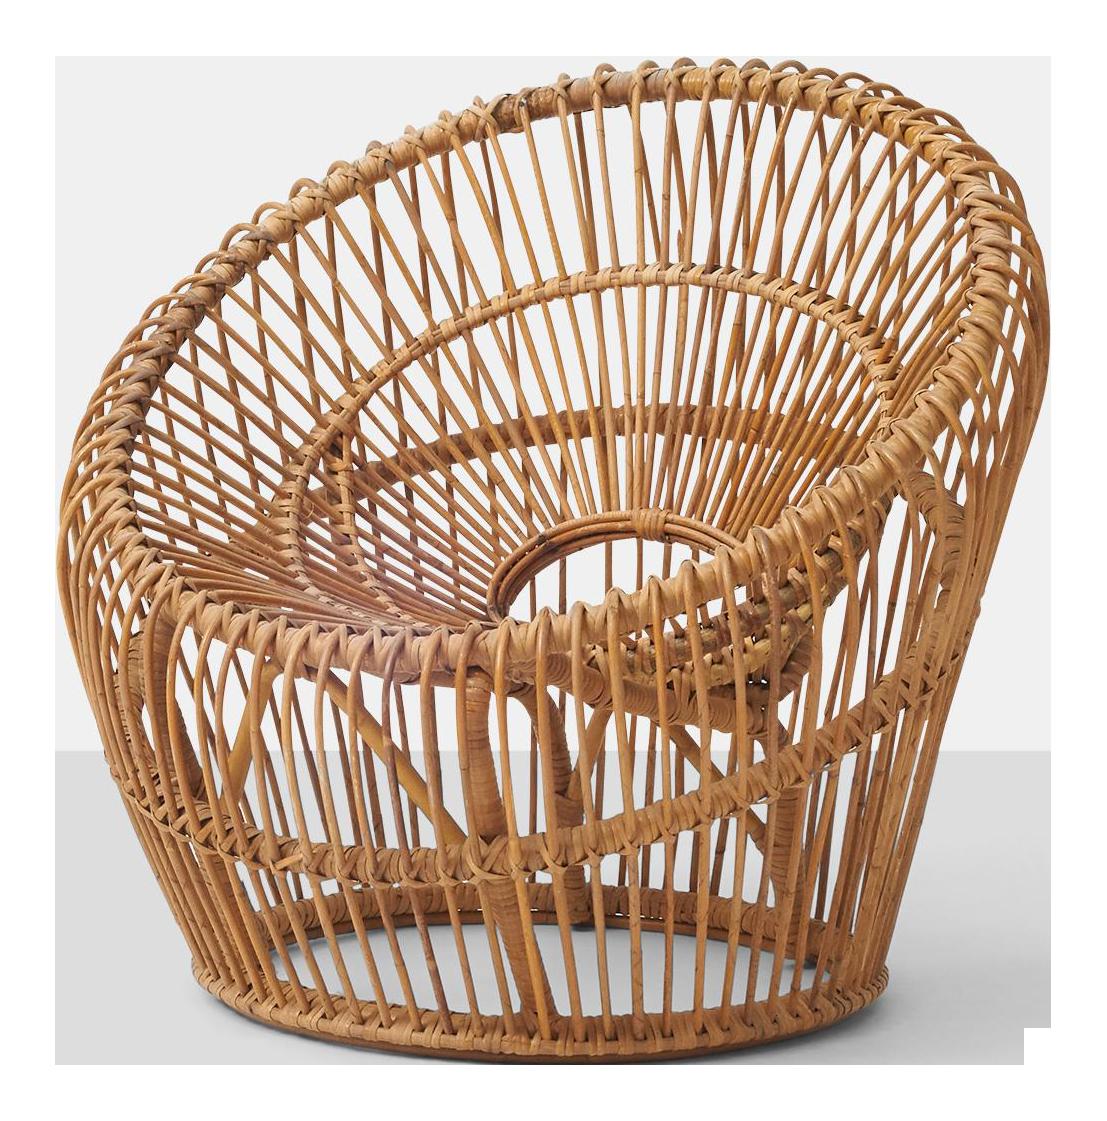 Genial Franco Albini Rattan Chair   Image 1 Of 6